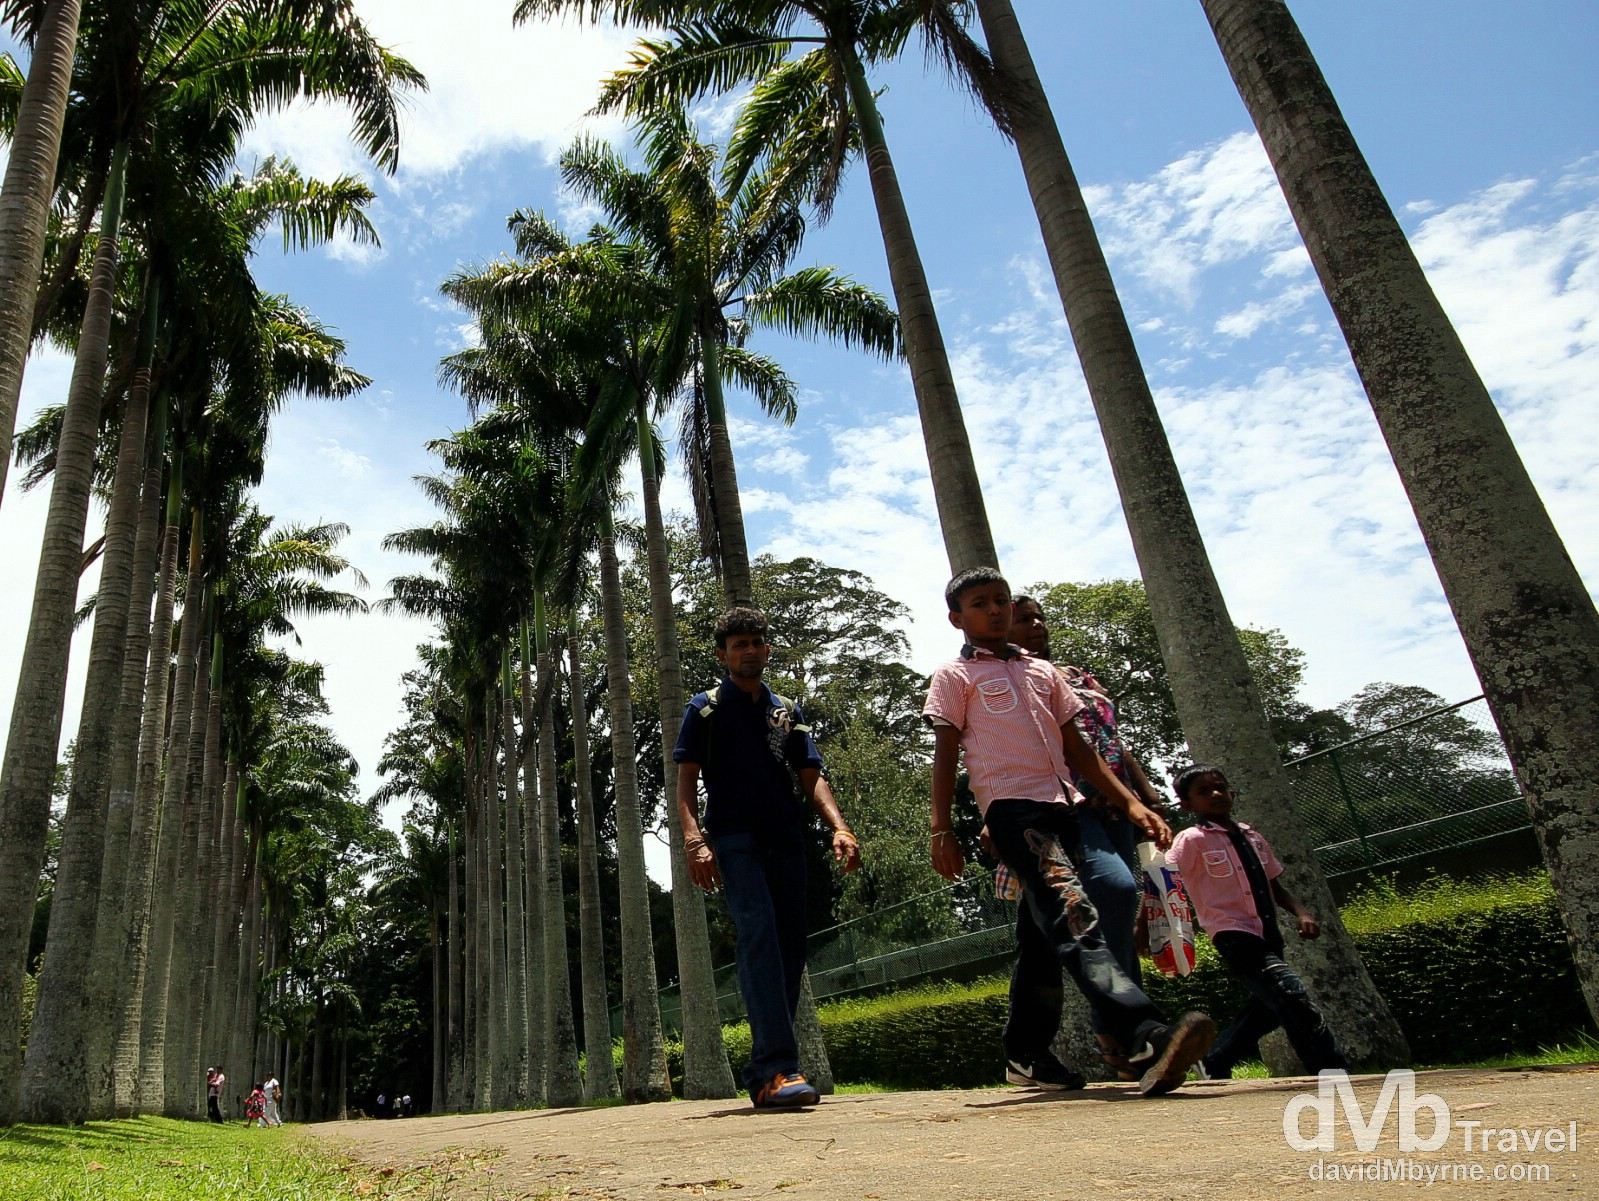 Walking Palm Avenue in Peradeniya Botanic Gardens on the outskirts of Kandy, Sri Lanka. September 9th 2102.